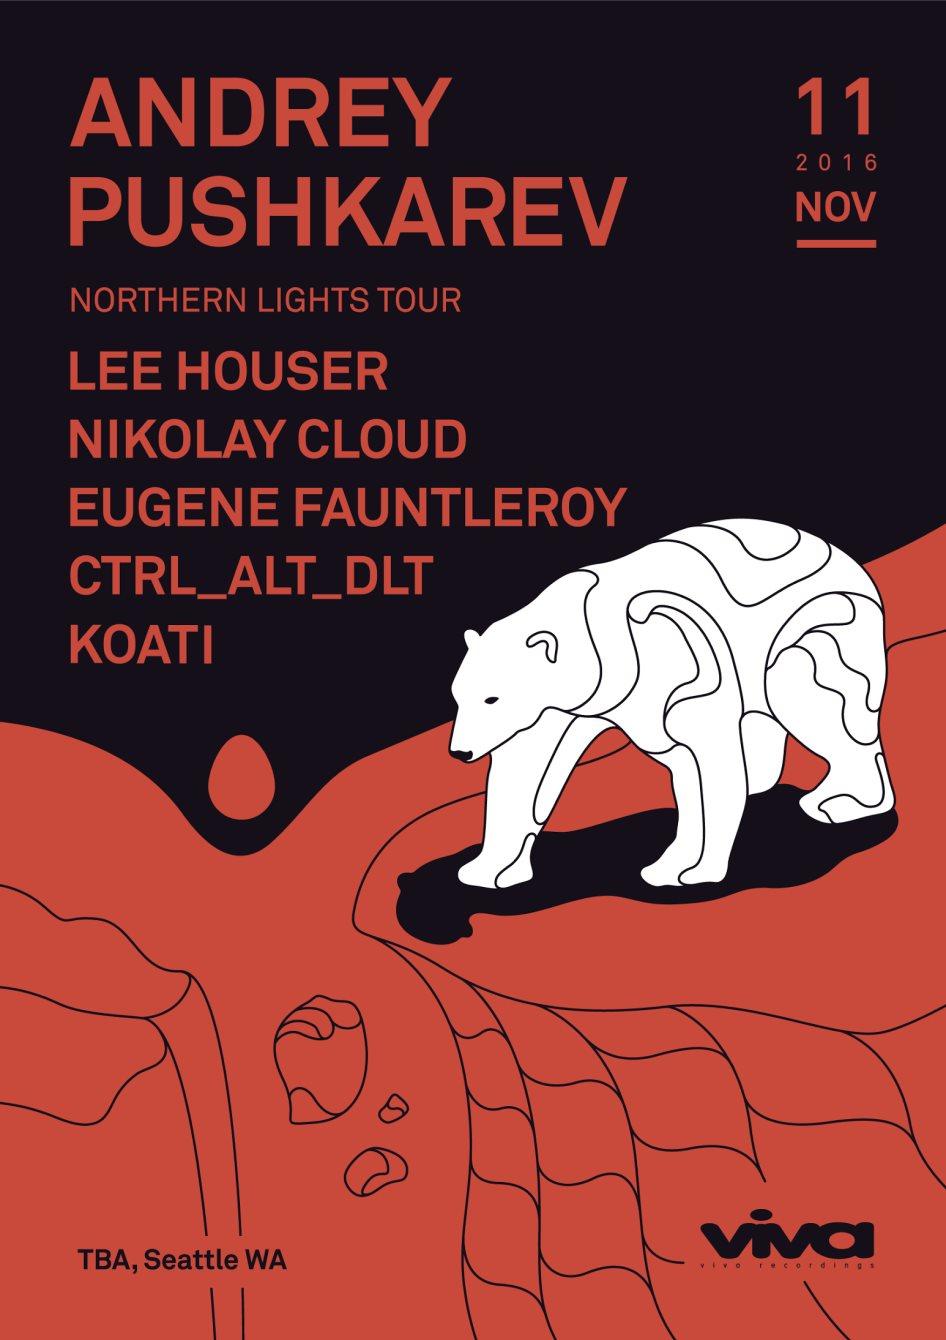 Andrey Pushkarev - Northern Lights Tour - Flyer front